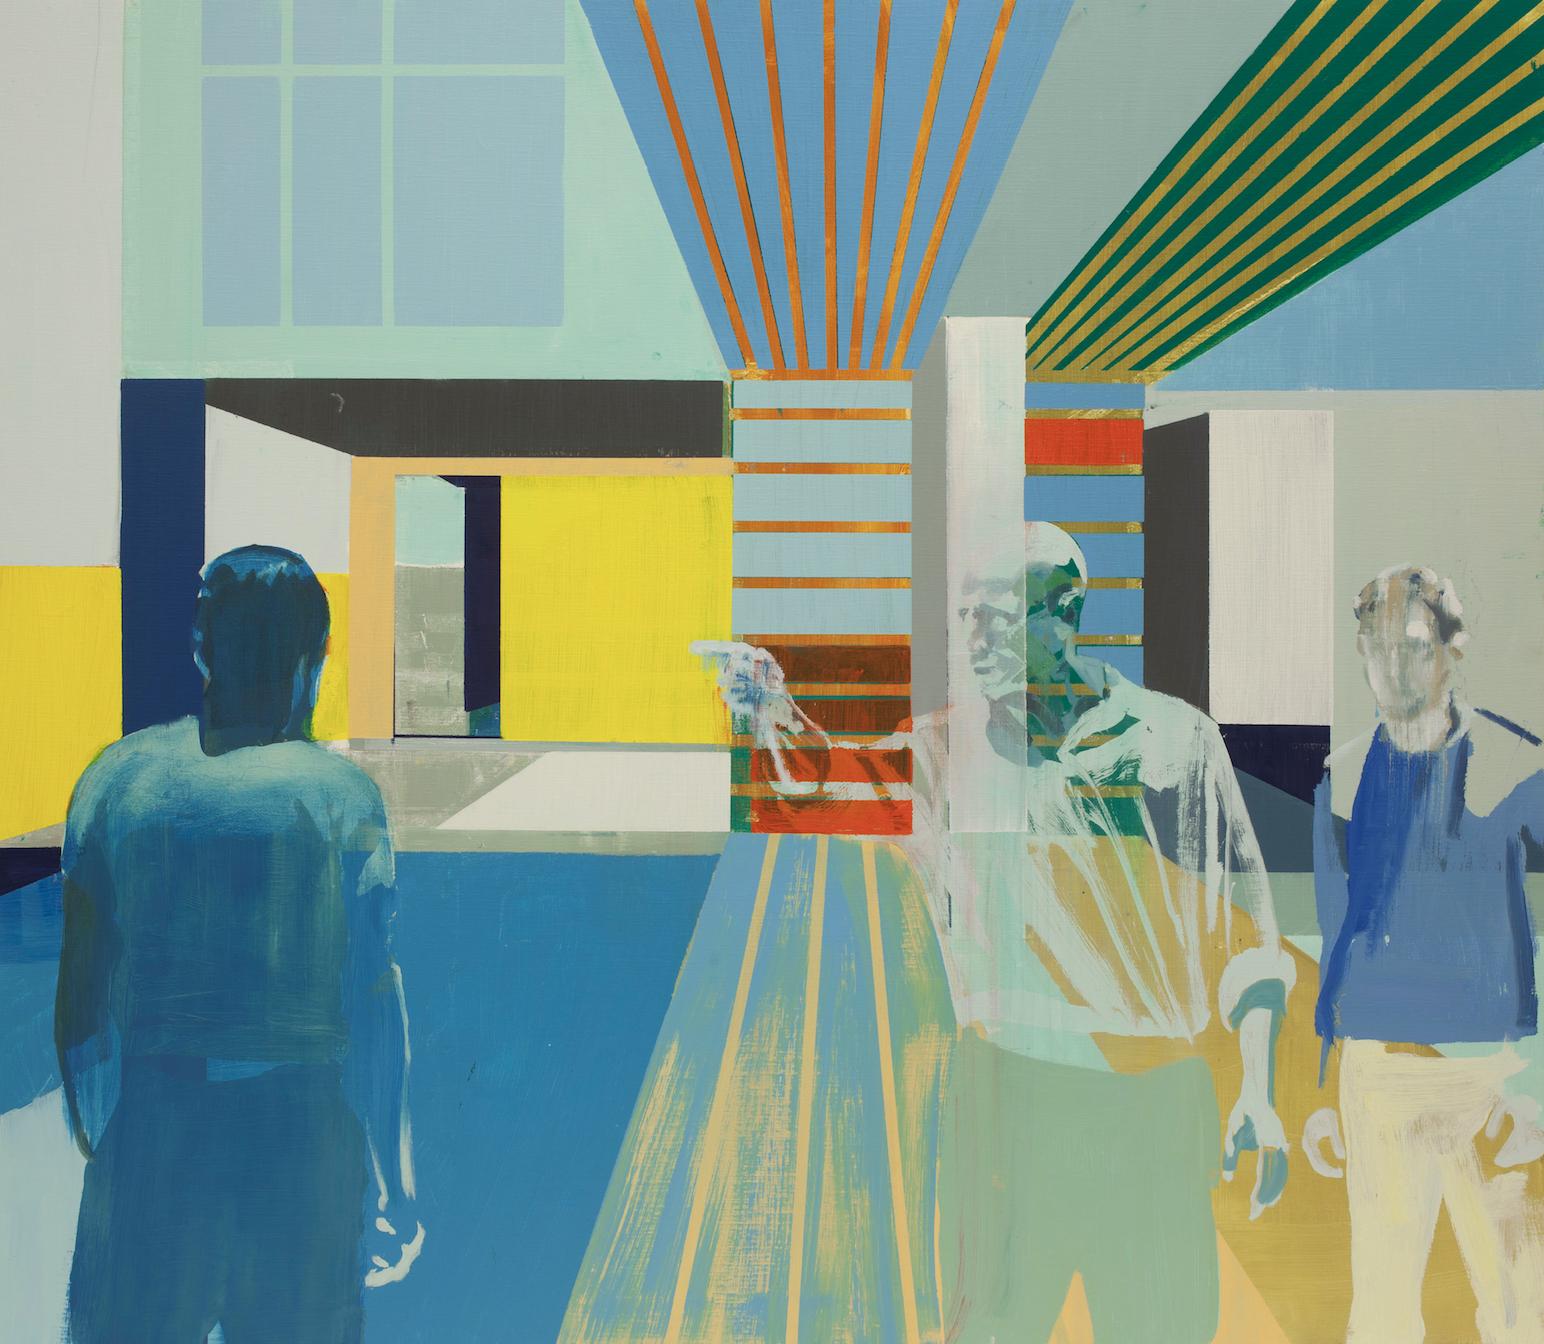 Kenneth Blom,  Tiger , 2019, Oil on canvas, 55 x 63 inches, 140 x 160 cm.